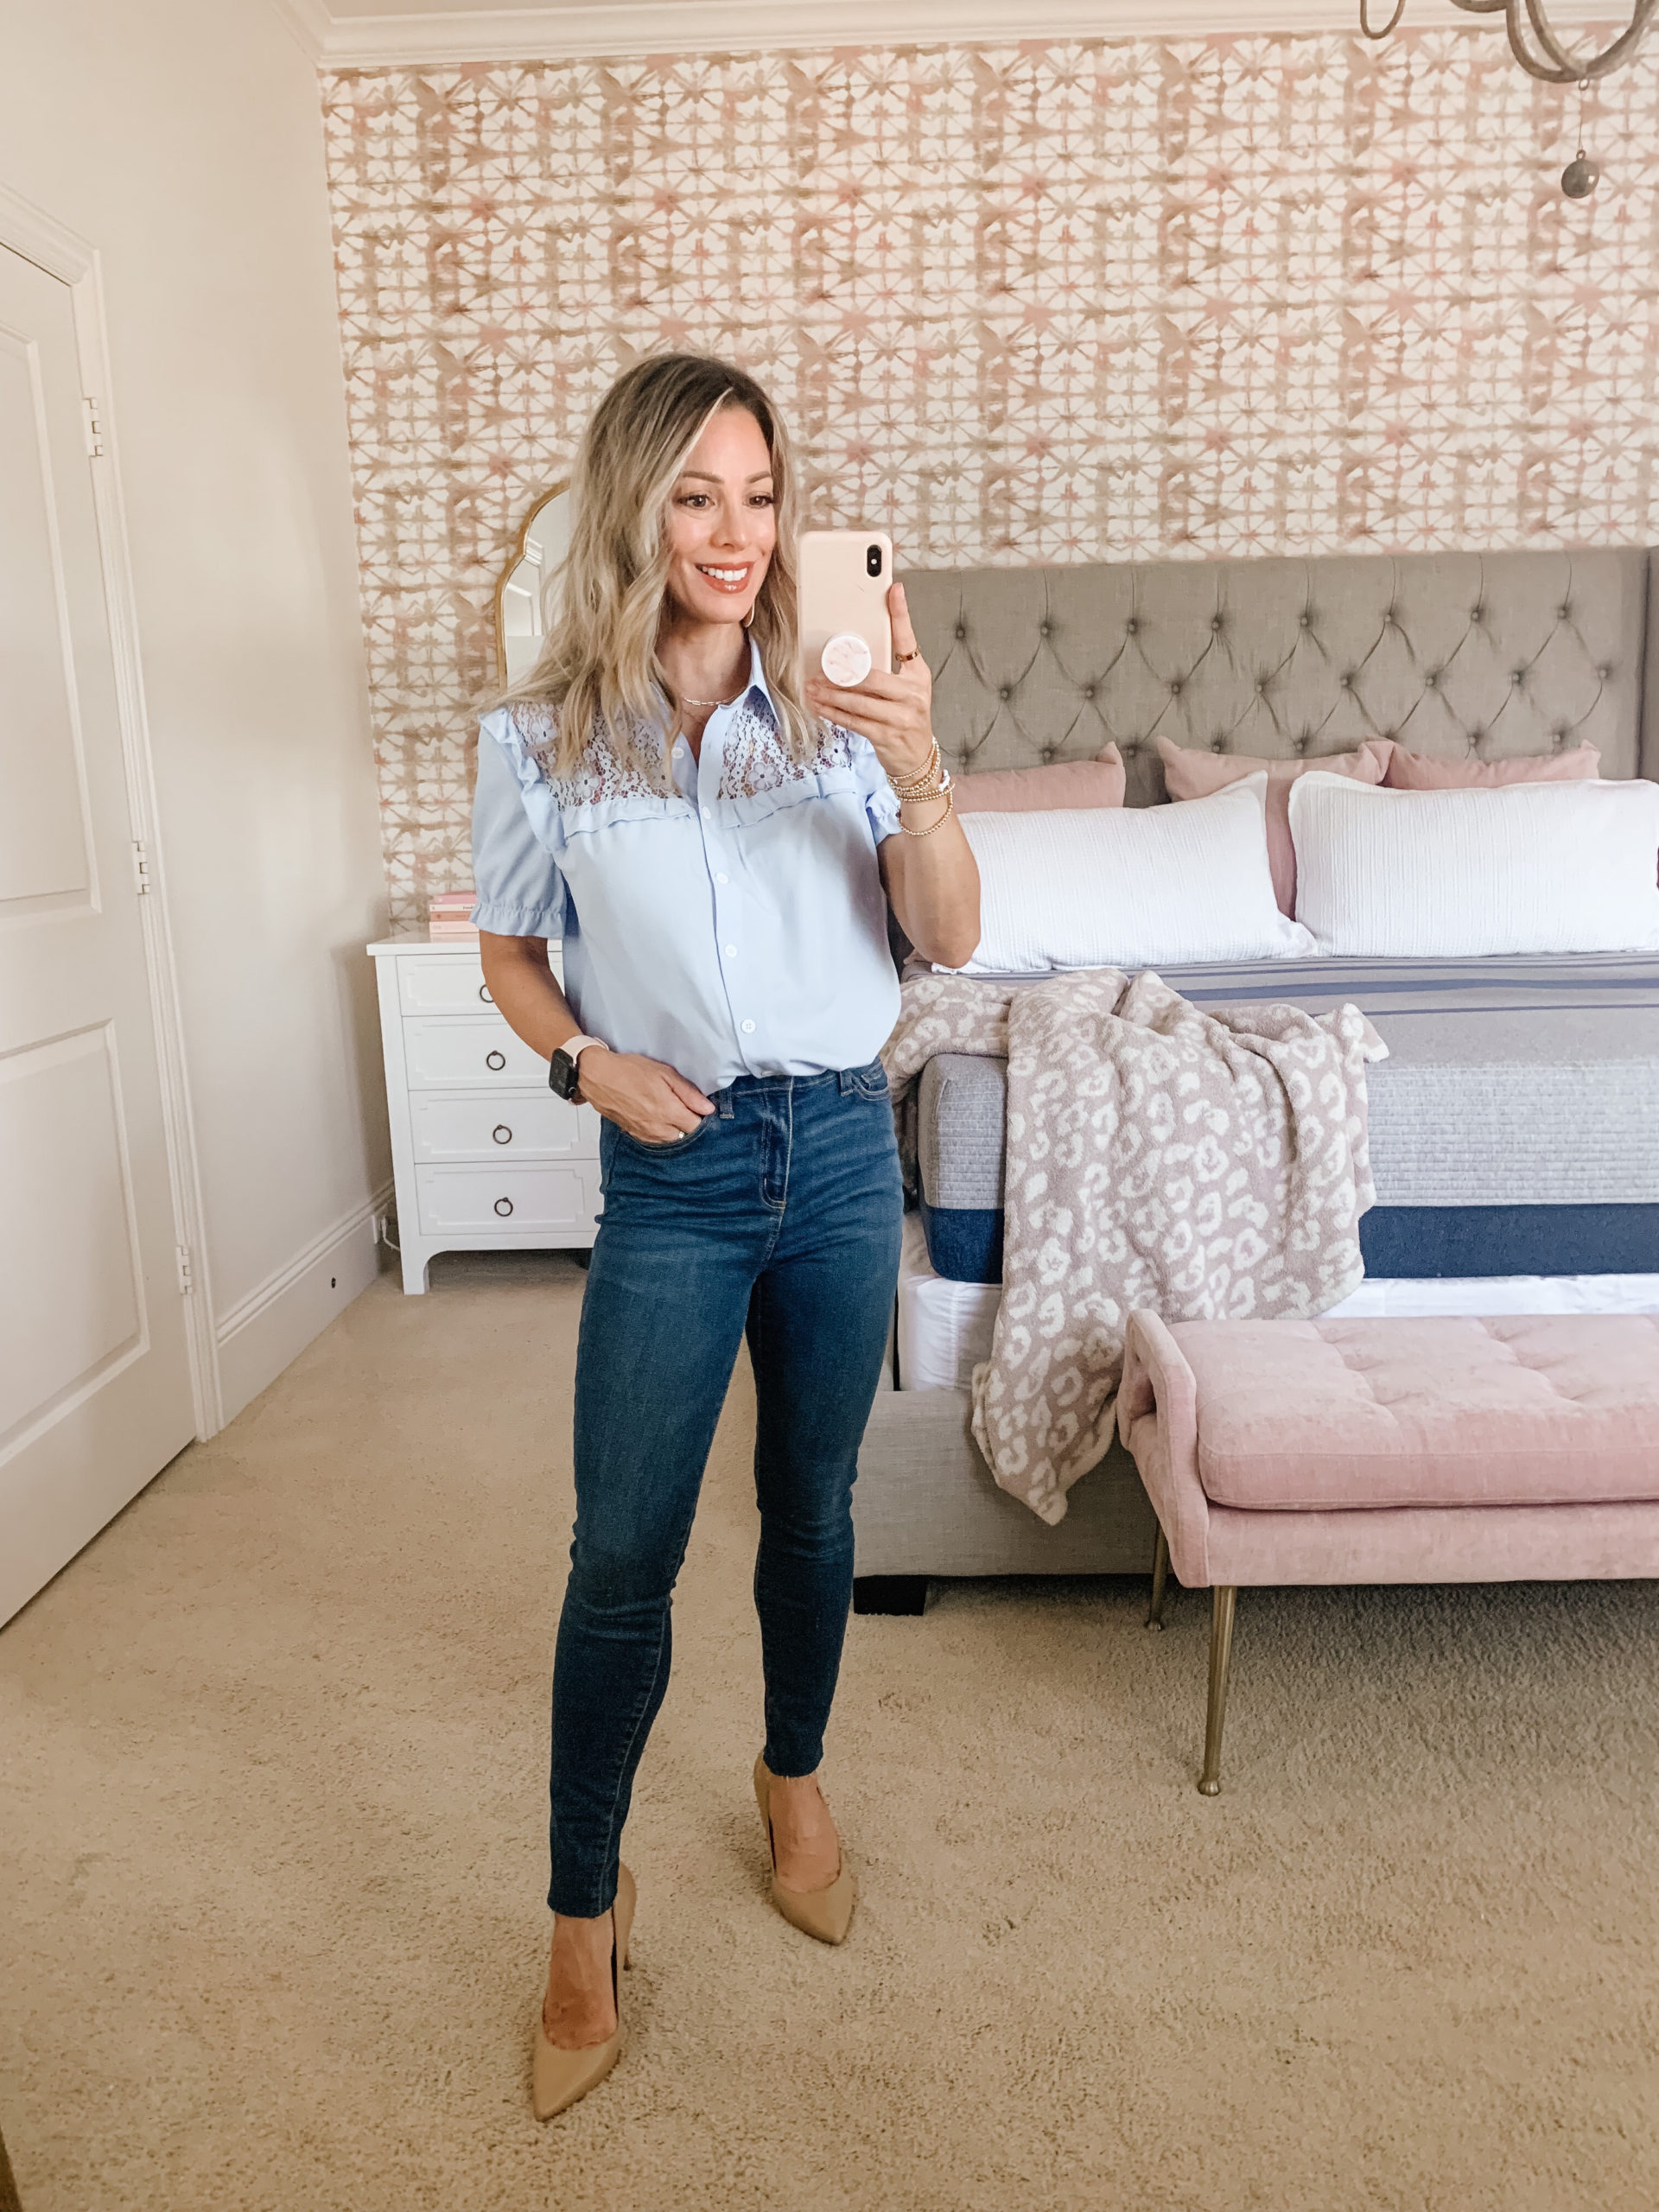 Amazon Fashion, Blue Top, Jeans, Heels